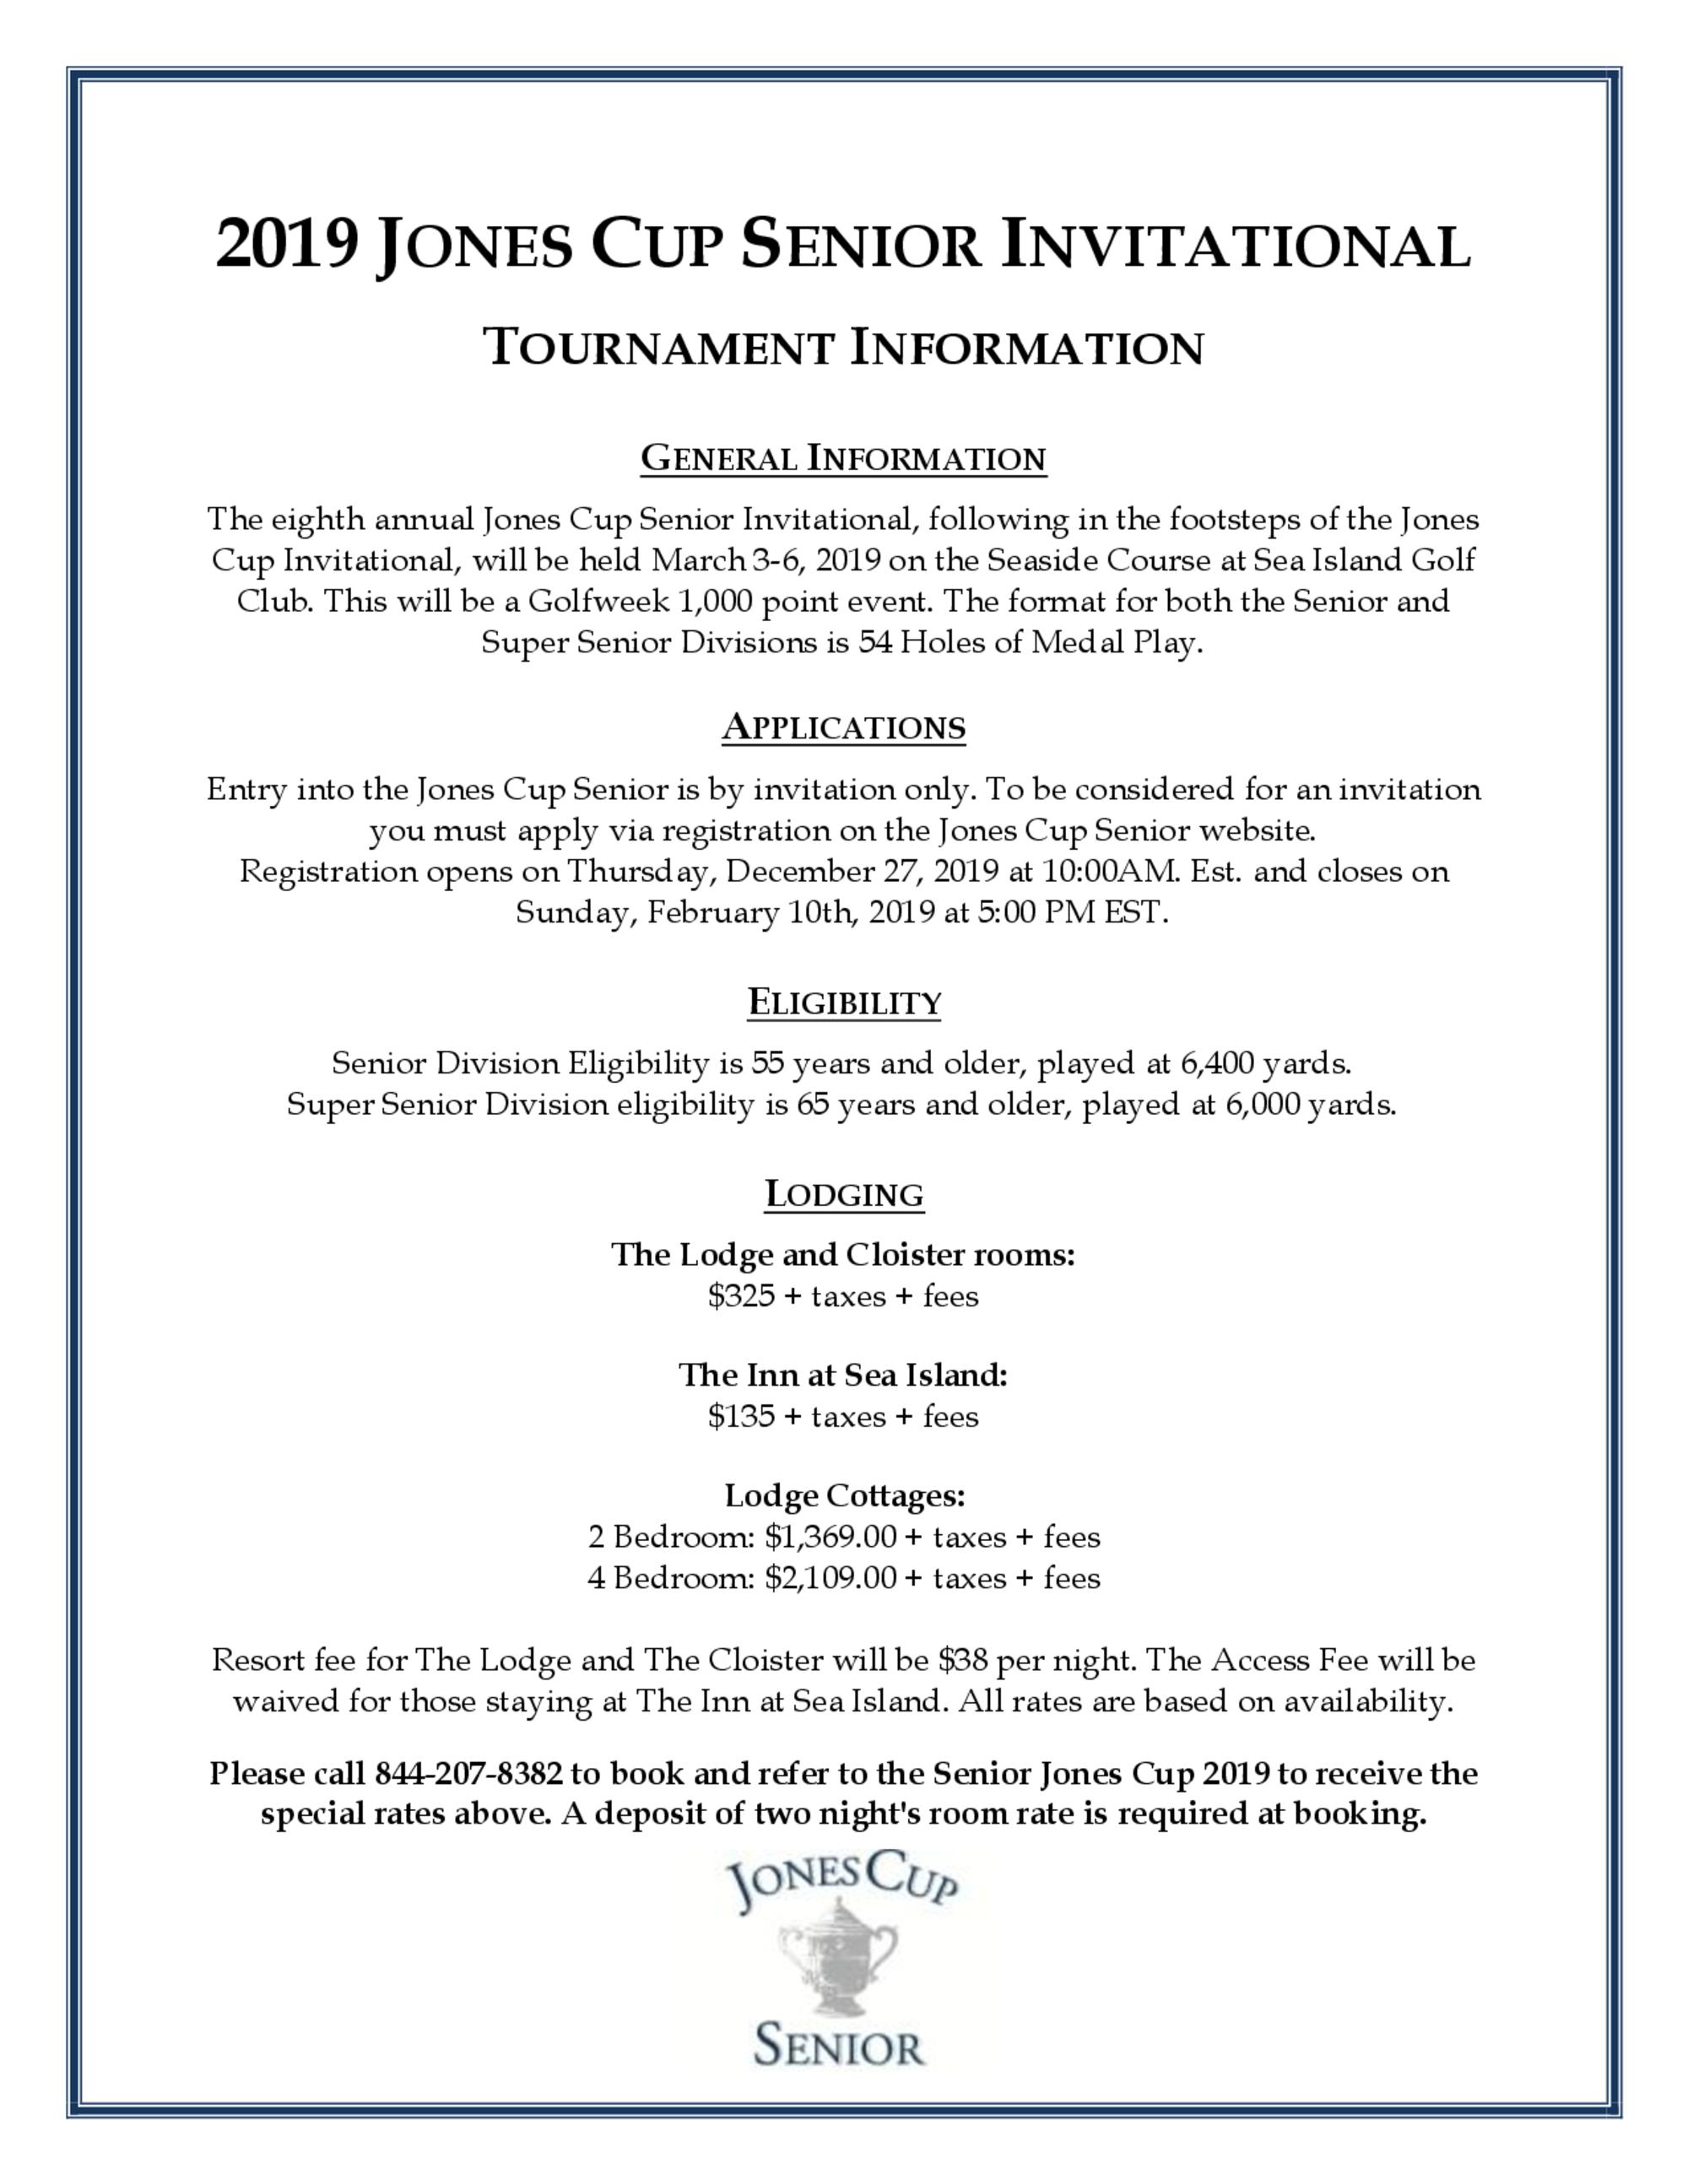 Tournament information for golf genius 2019 1